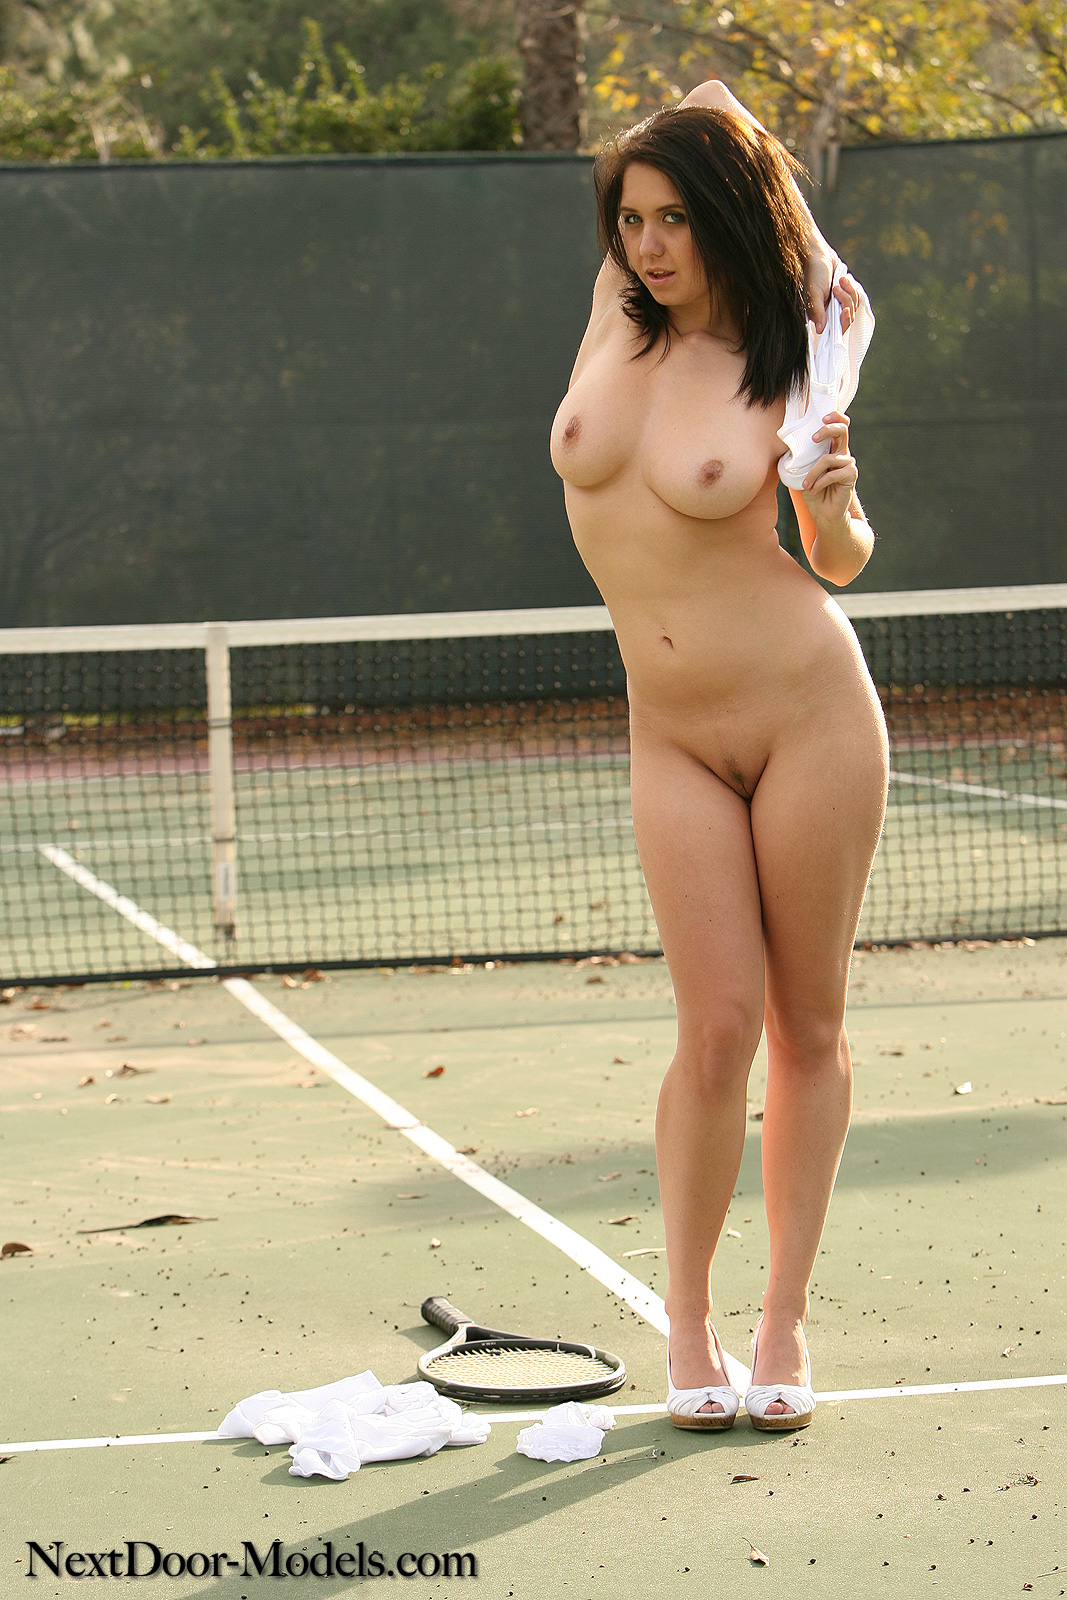 hot women in tennis naked